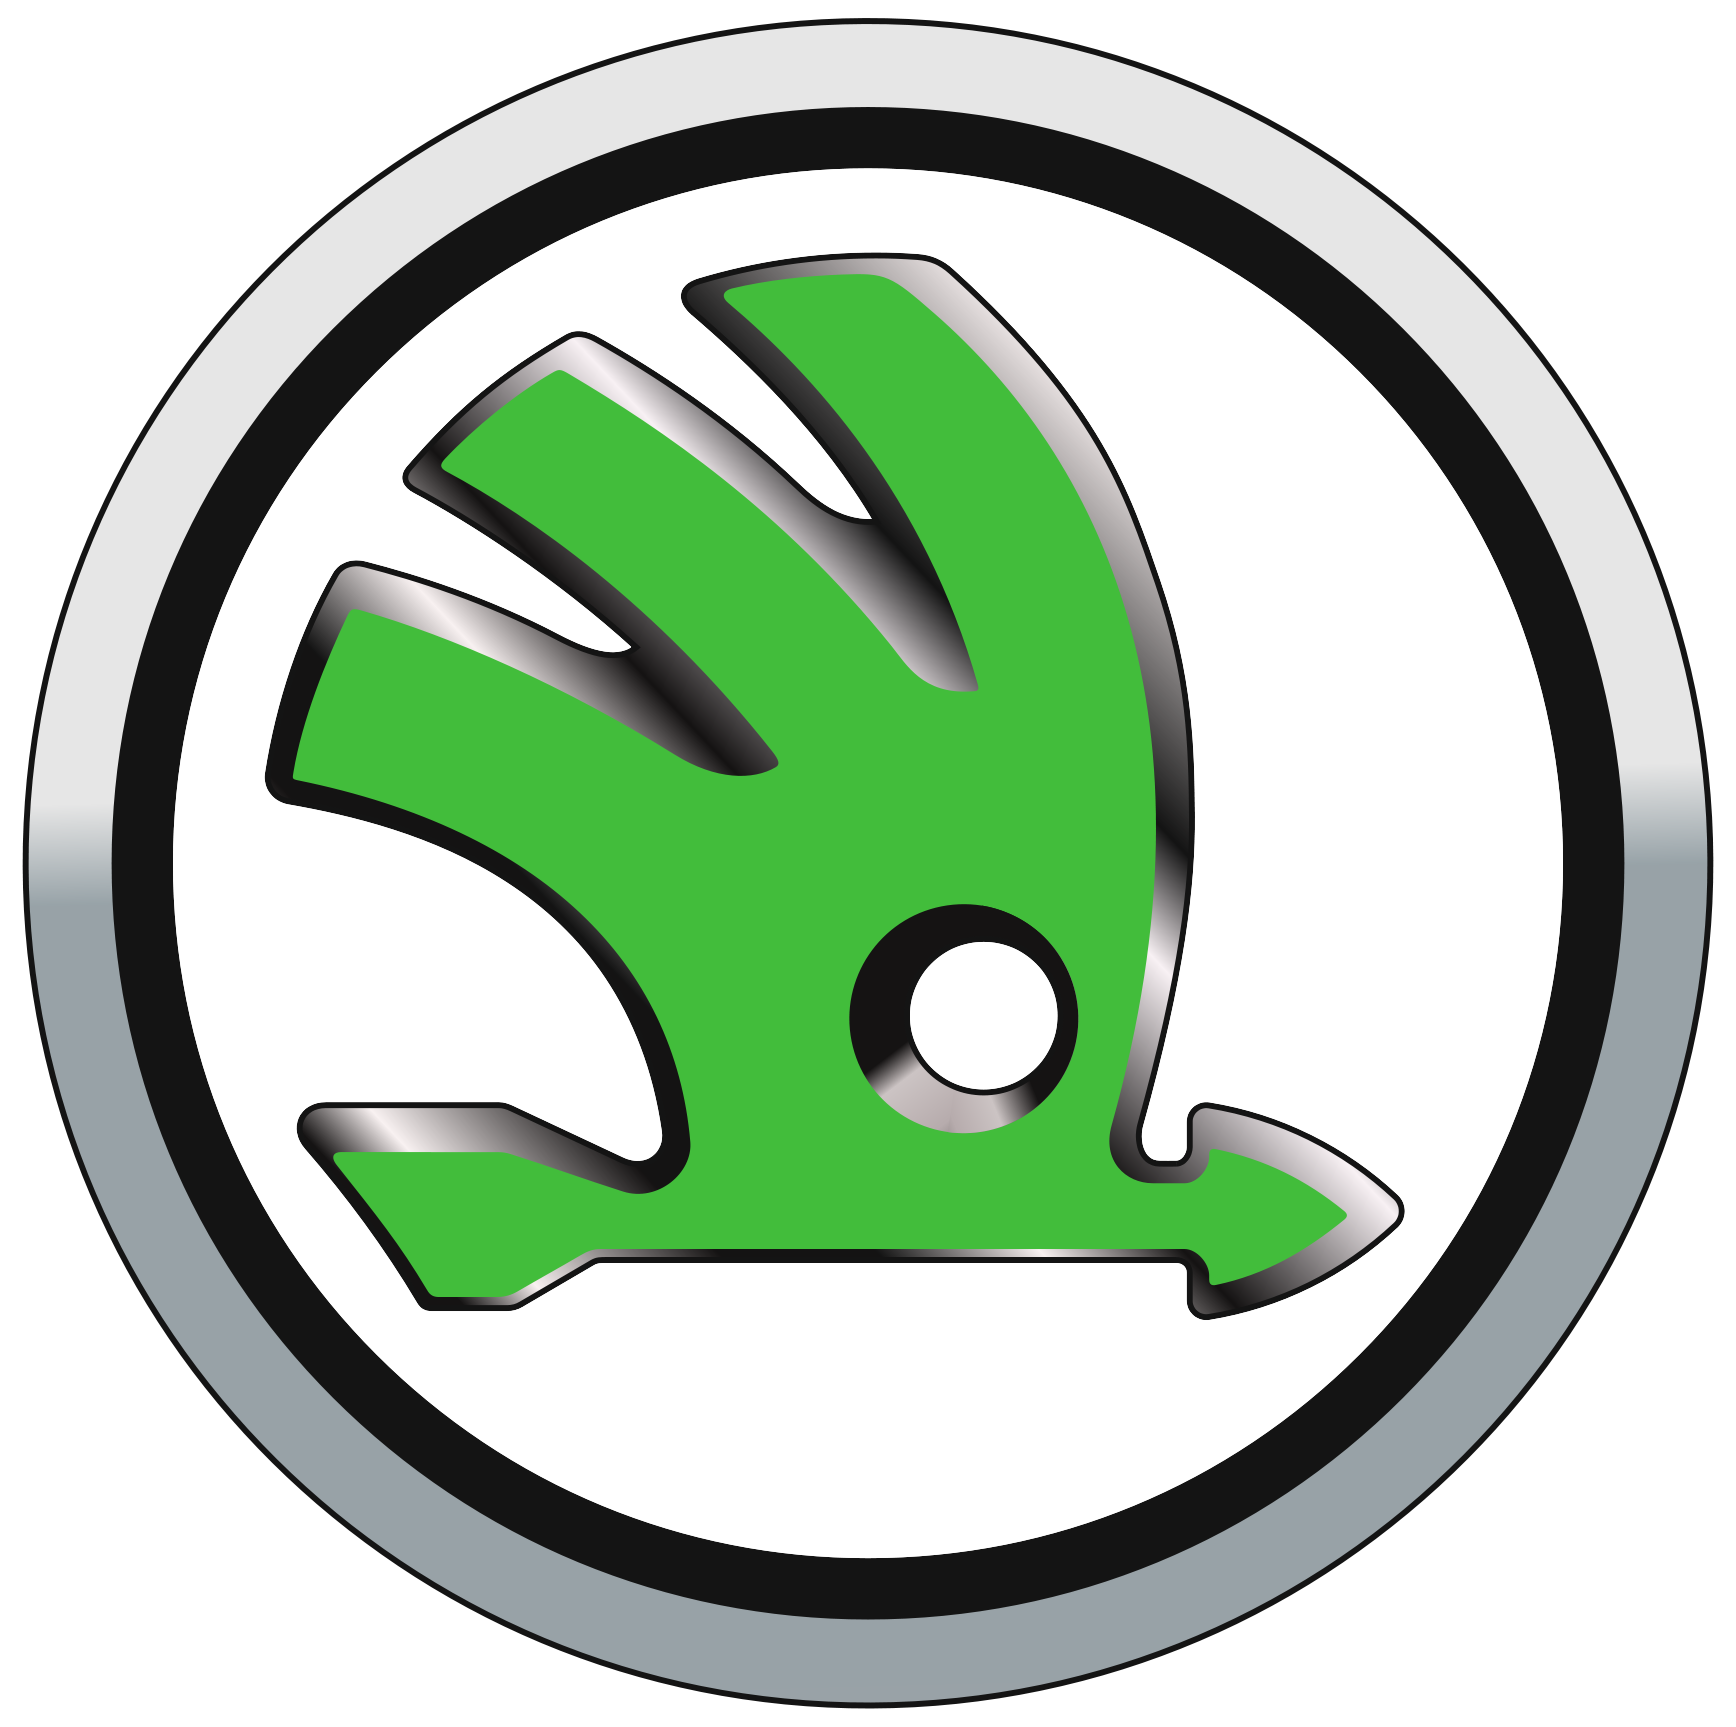 koda logo, skoda car symbol png 2305 Free Transparent